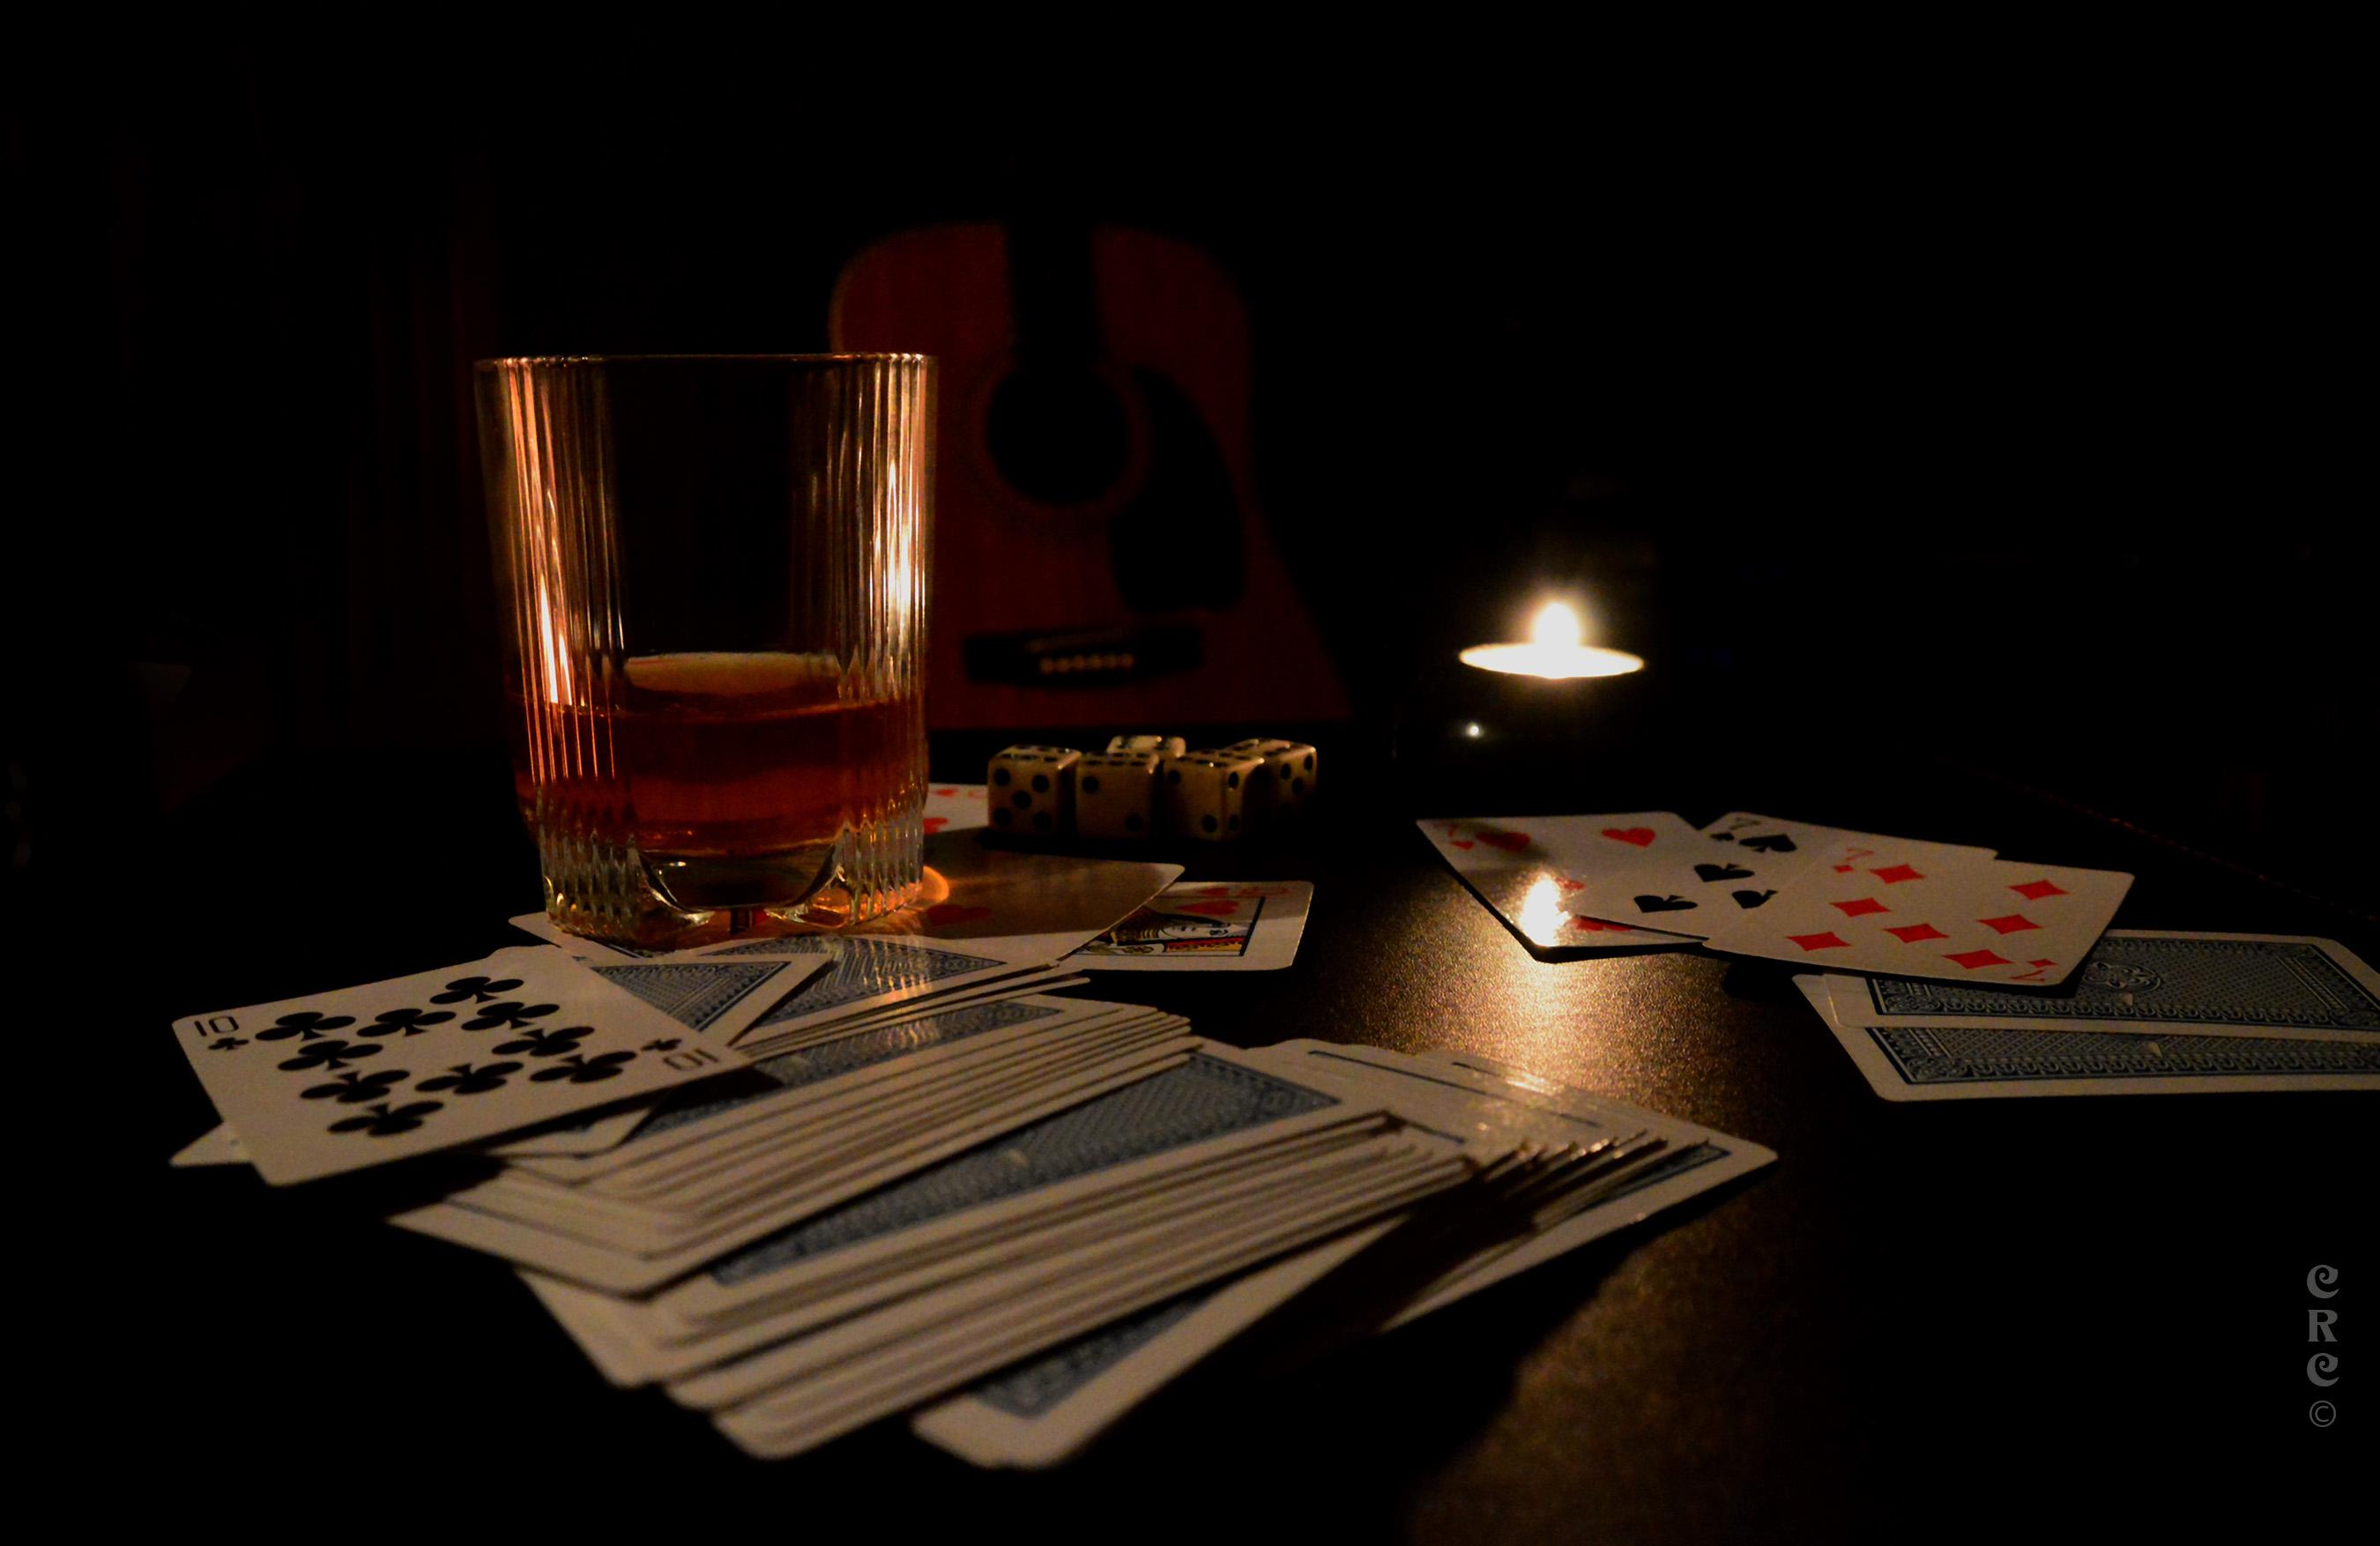 Top Papel de parede : Vida de stilllife, criativo, baralho de cartas  AX84